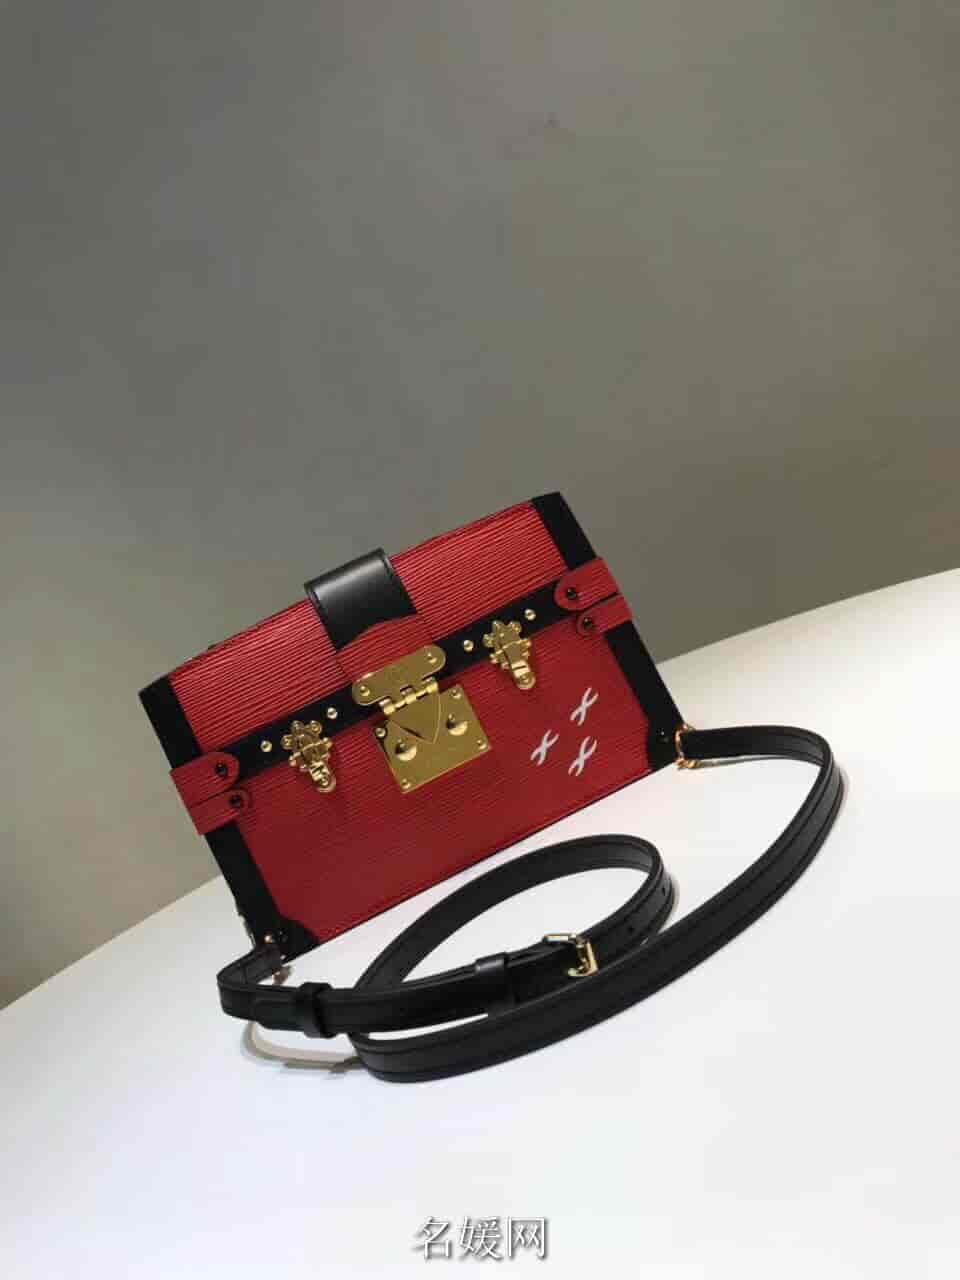 LV/路易威登 新款 TRUNK 拼色软盒子链条包单肩斜跨包女包 M51697